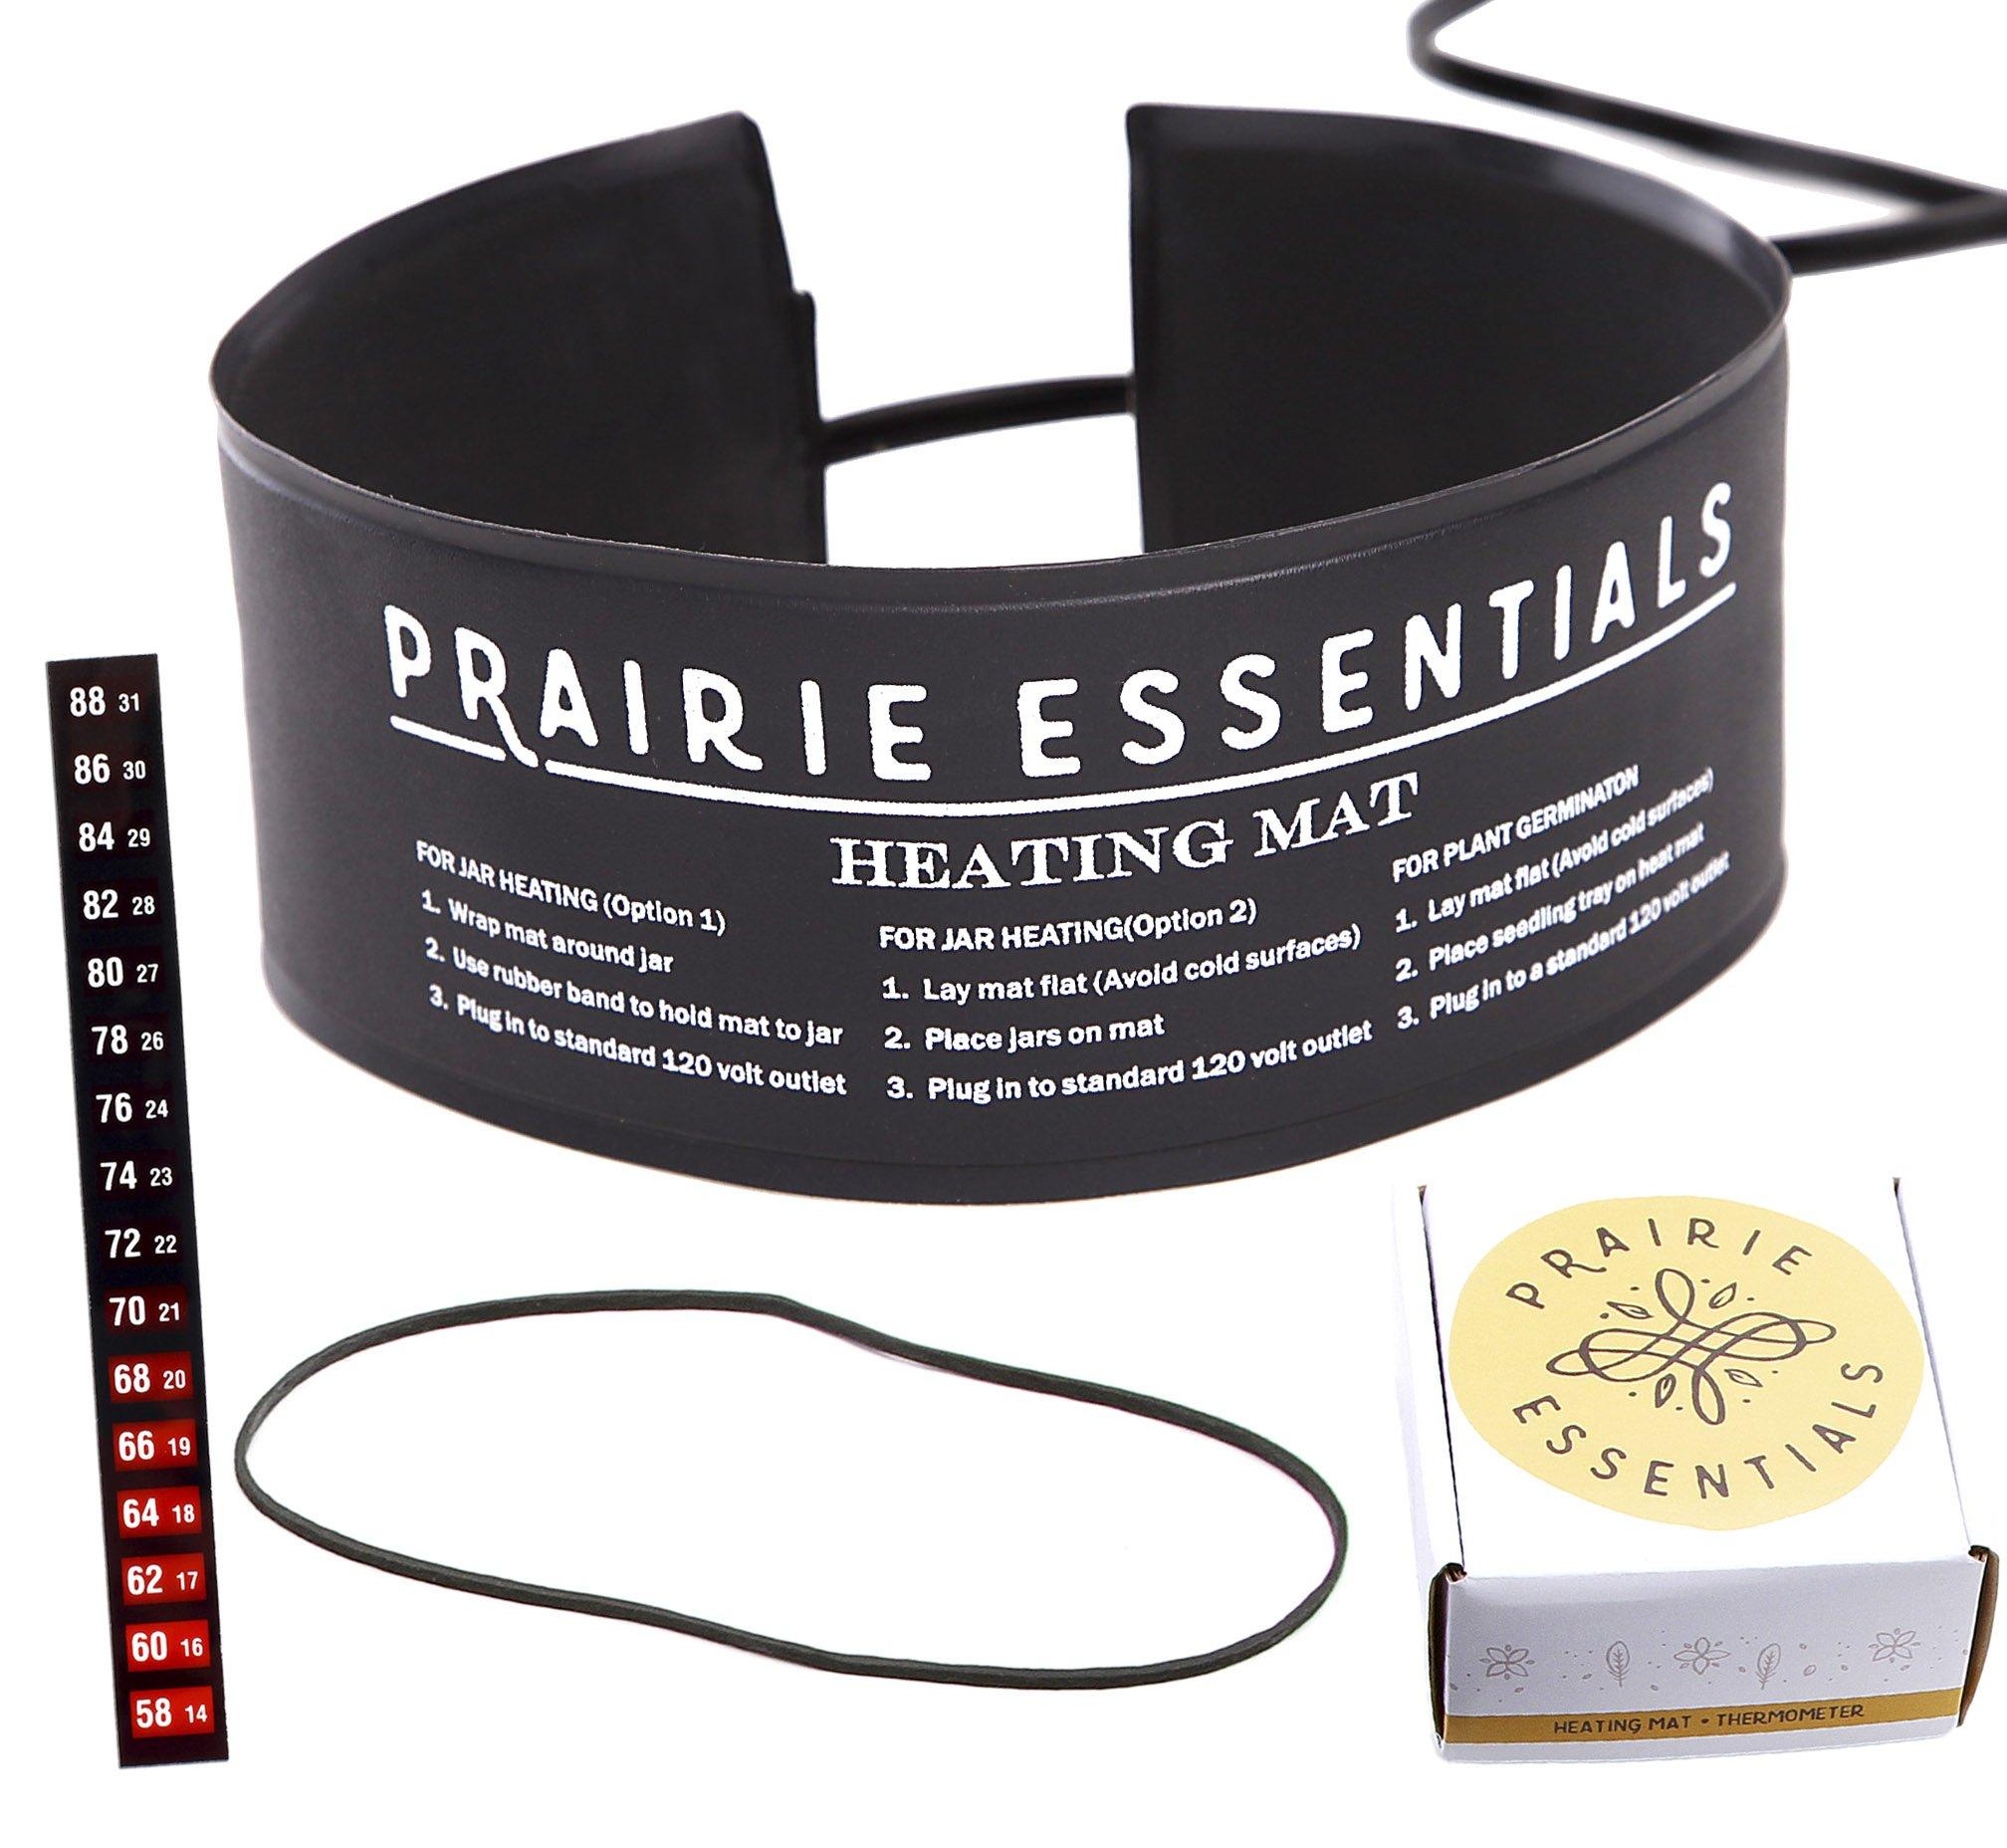 Prairie Essentials 3x20 inch Strip Wrap Around Heating Pad Warming Heat Mat & Thermometer for Kombucha Tea & Beer Brewing, Fermentation, Seedlings & Plant Germination (1, 3'' x 20'')